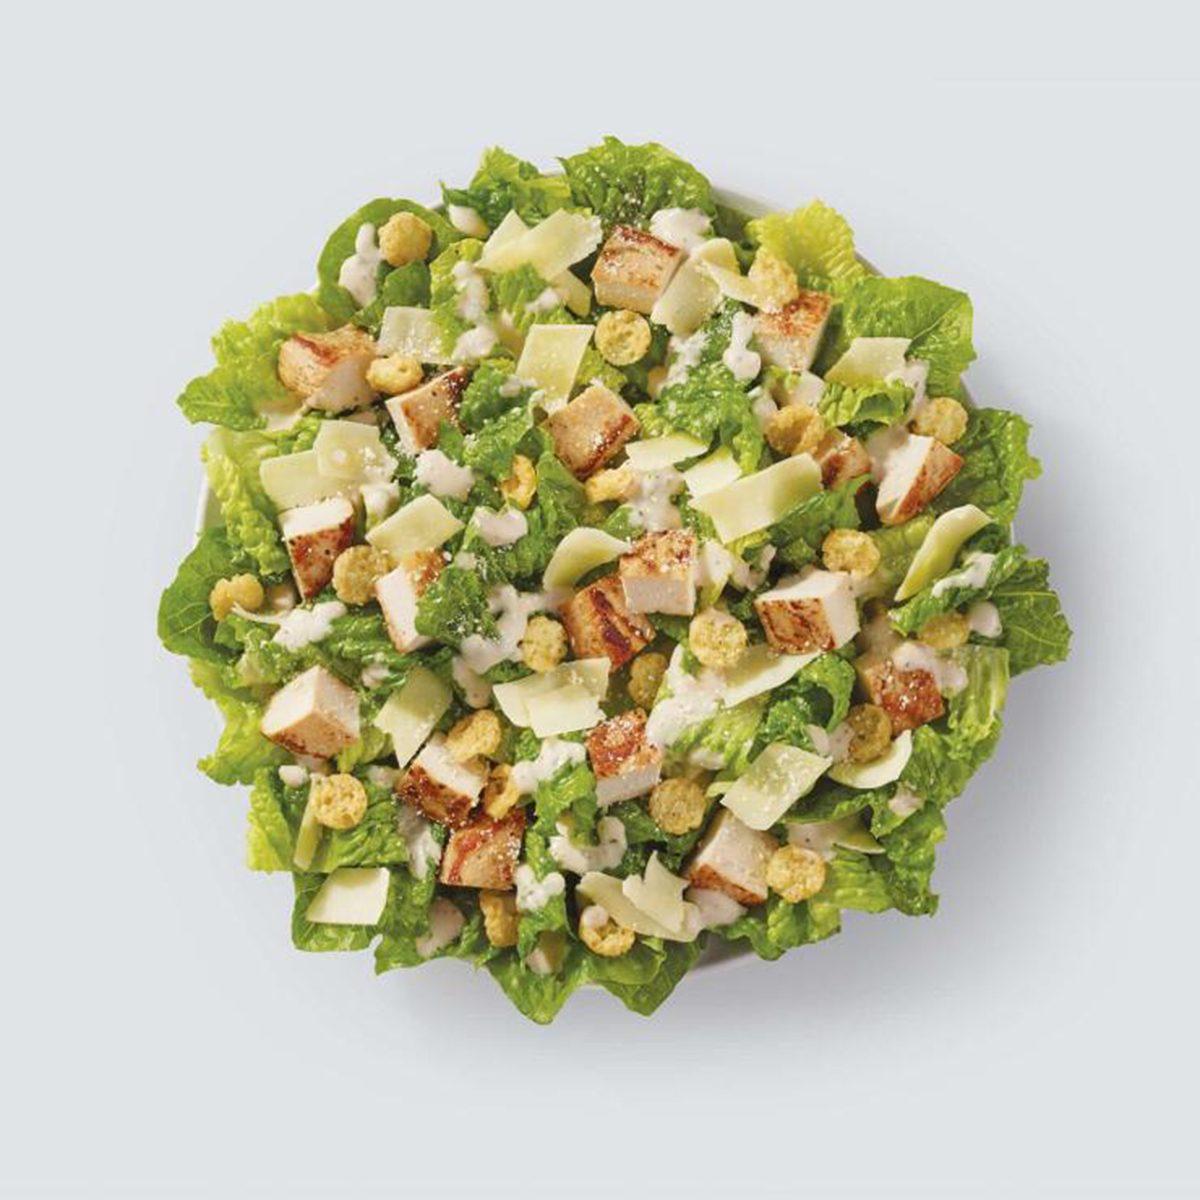 wendys parmesan caesar salad